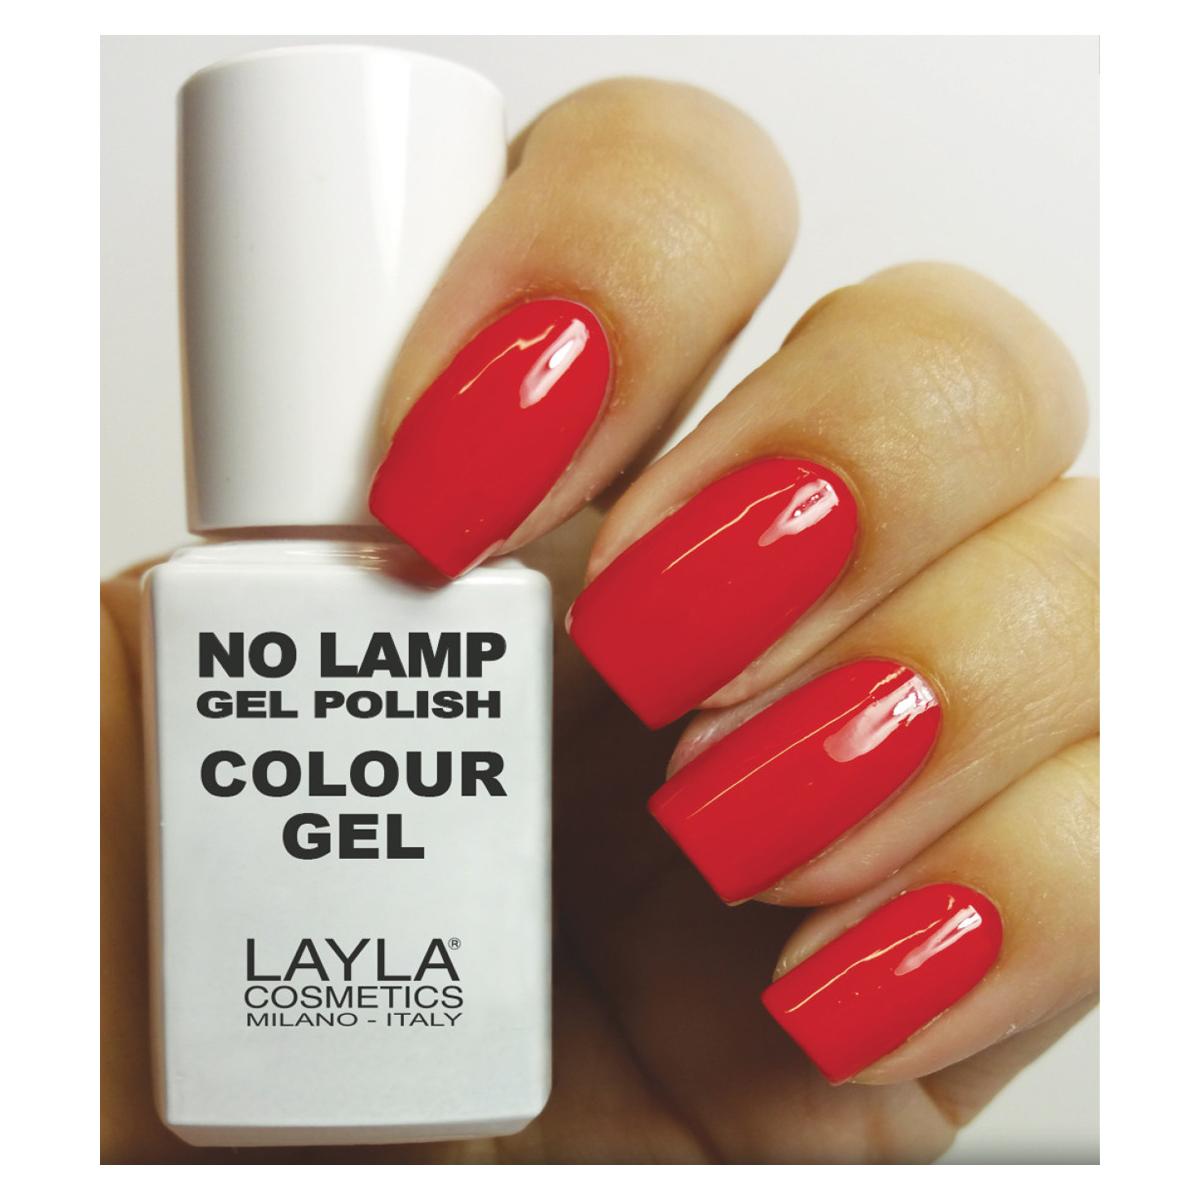 Layla  No lamp gel polish  smalto 7 wondered